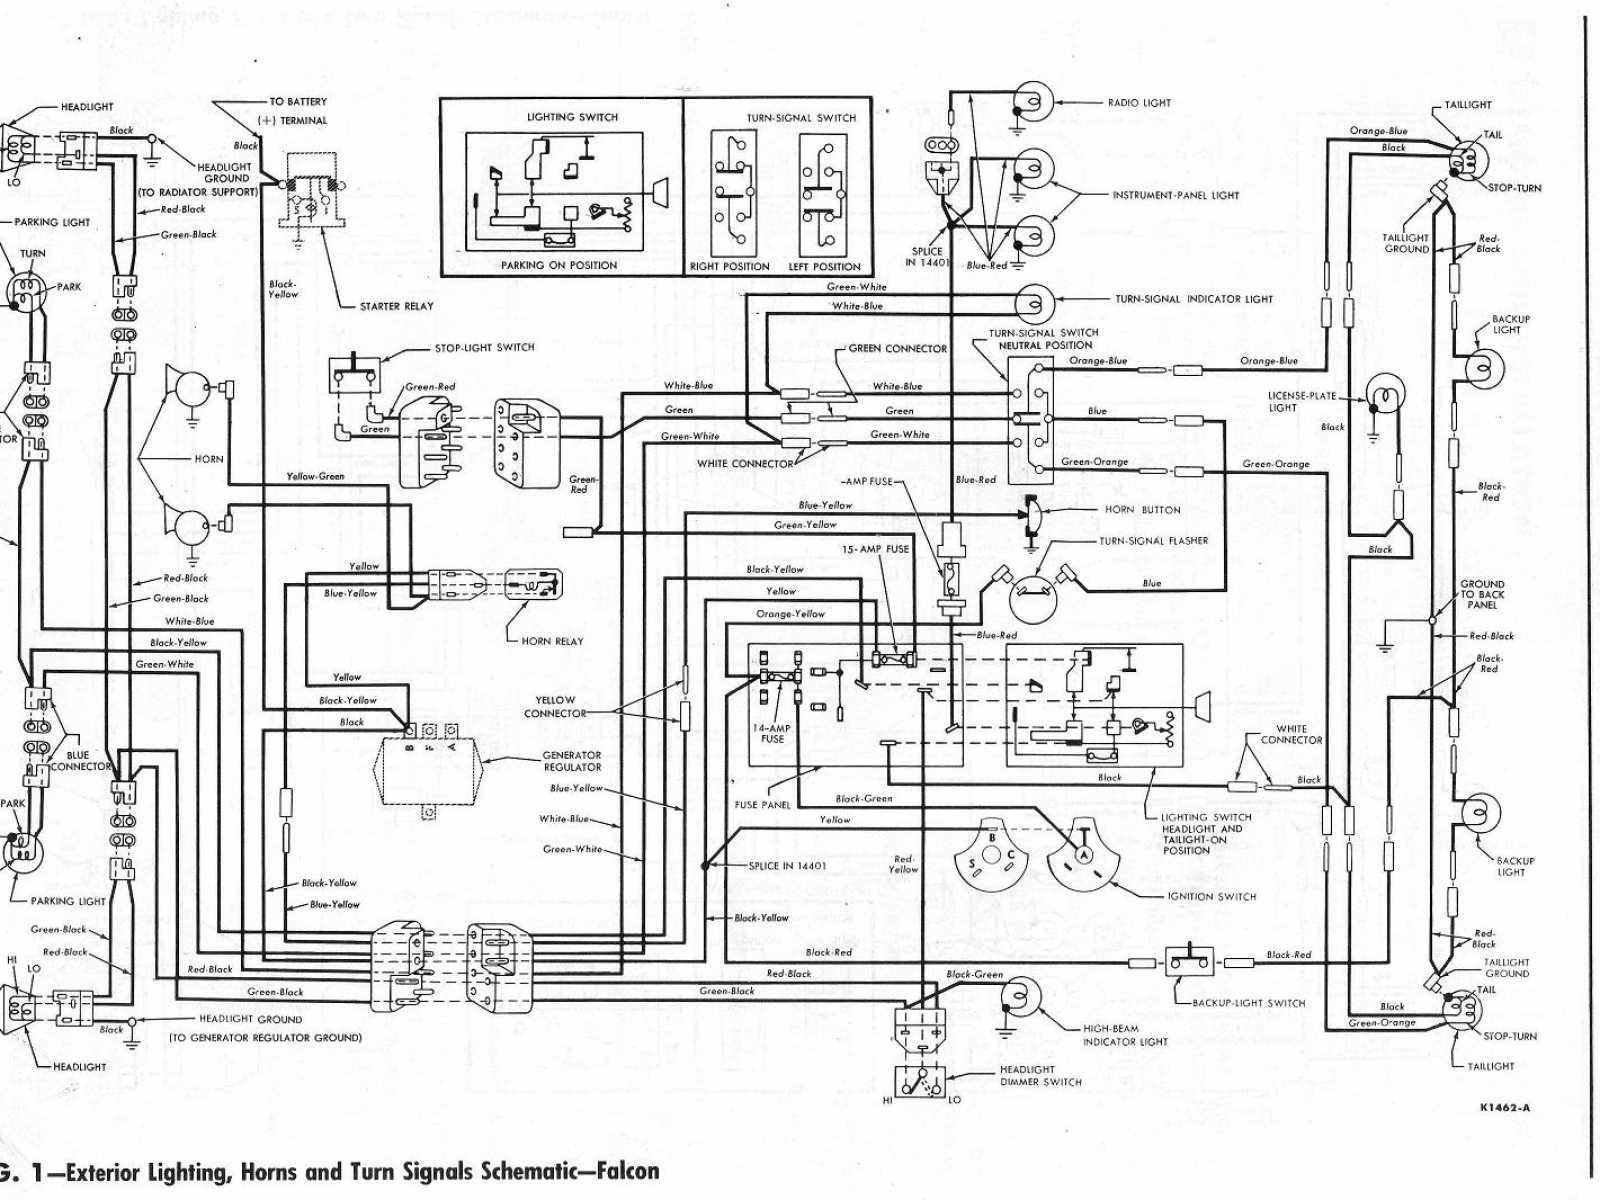 medium resolution of studebaker wiring harness wiring diagram expert 1948 studebaker wiring harness studebaker wiring harness